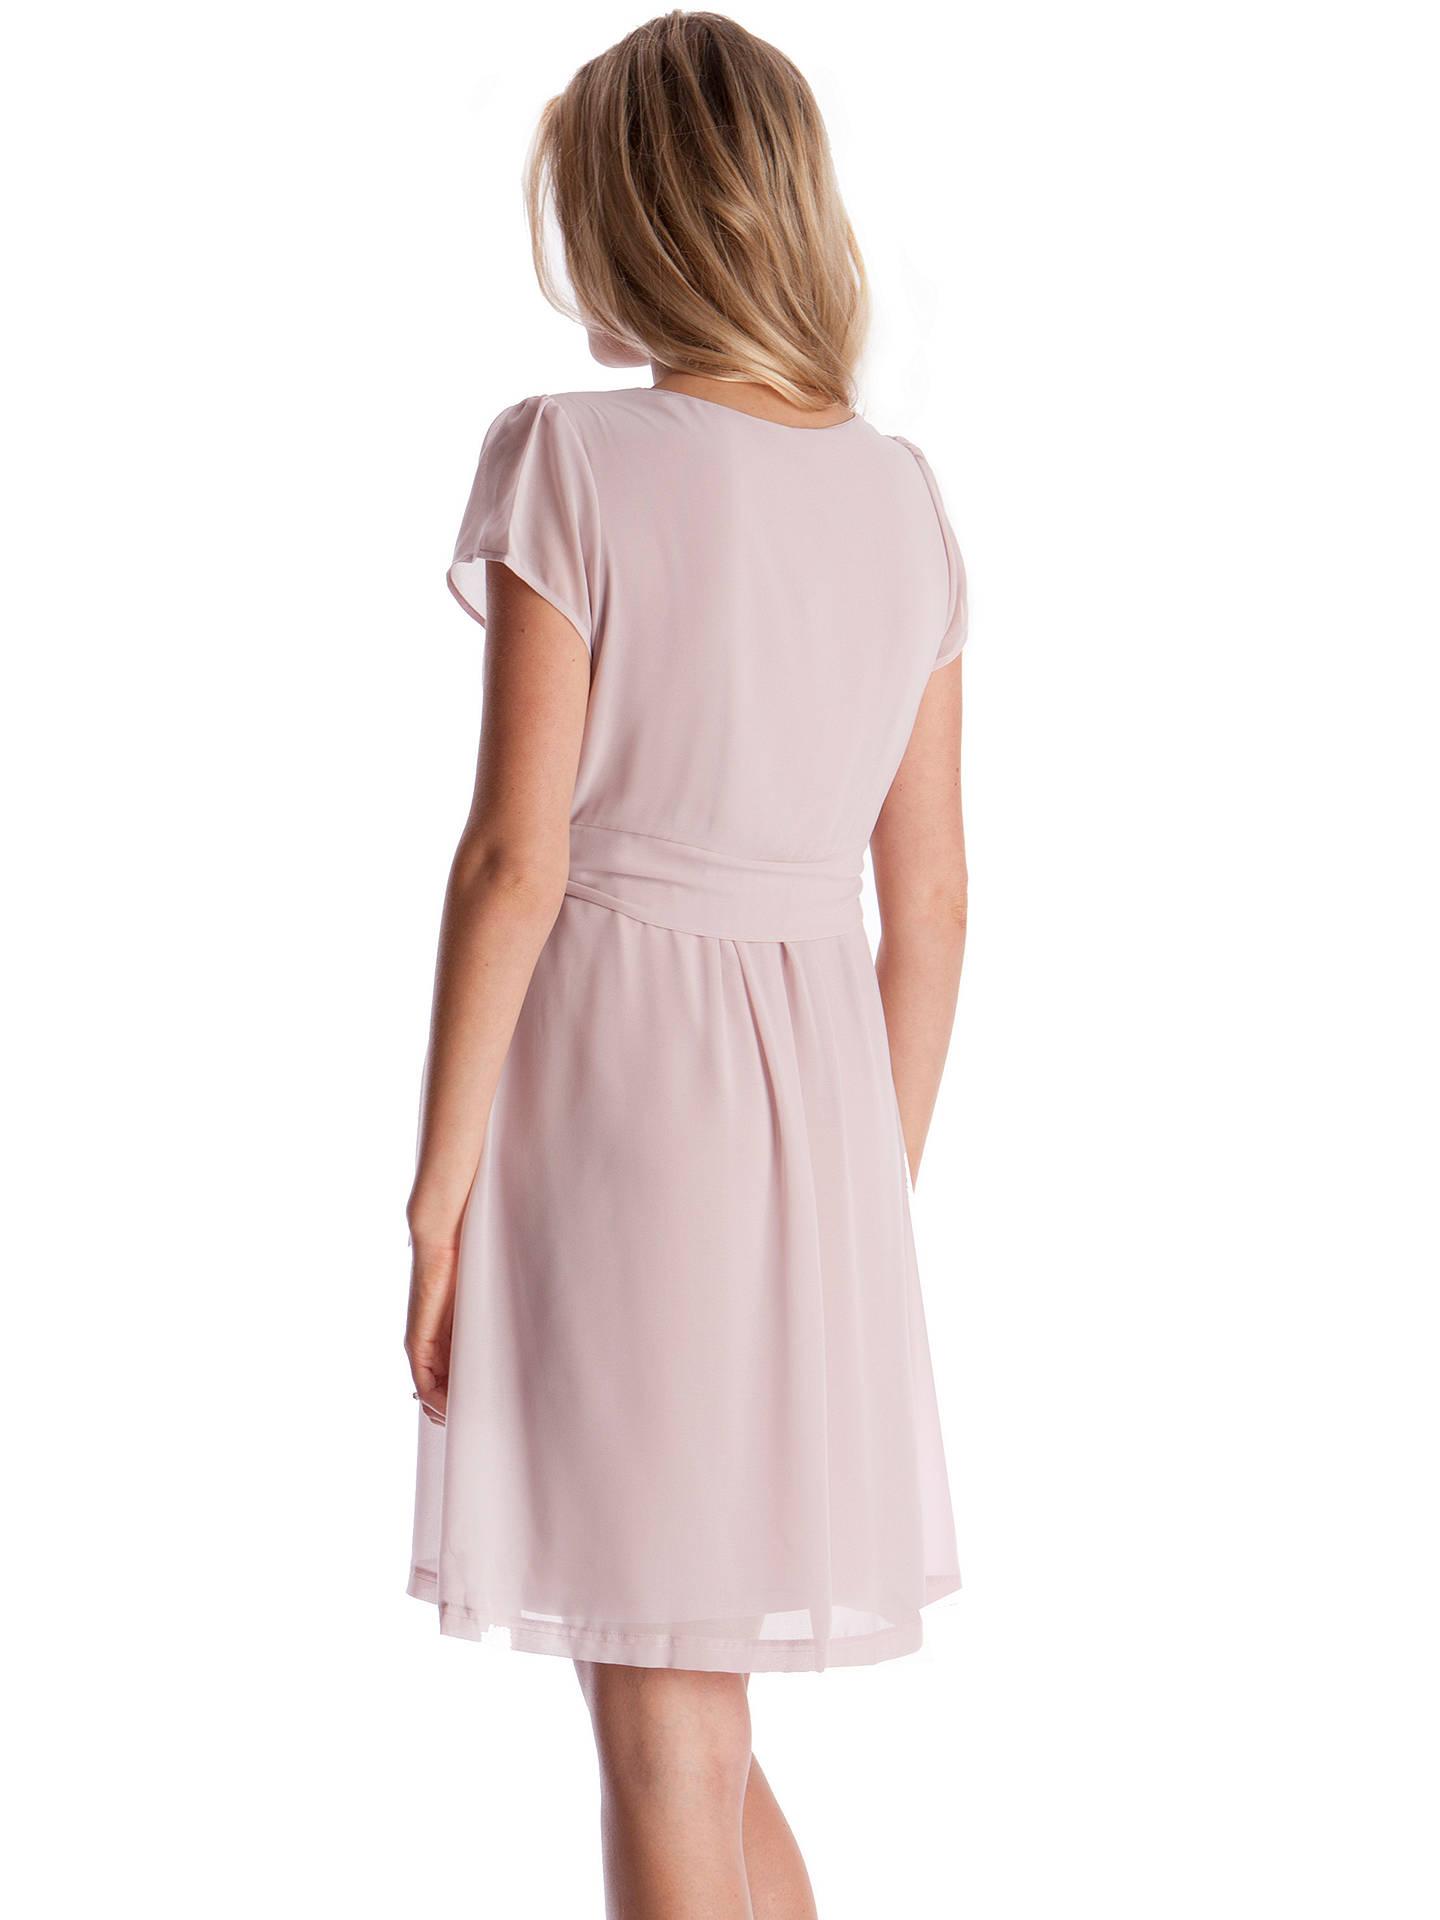 fcbf14589d0b4 ... Buy Séraphine Jodie Short Sleeve Maternity/Nursing Dress, Blush, 8  Online at johnlewis